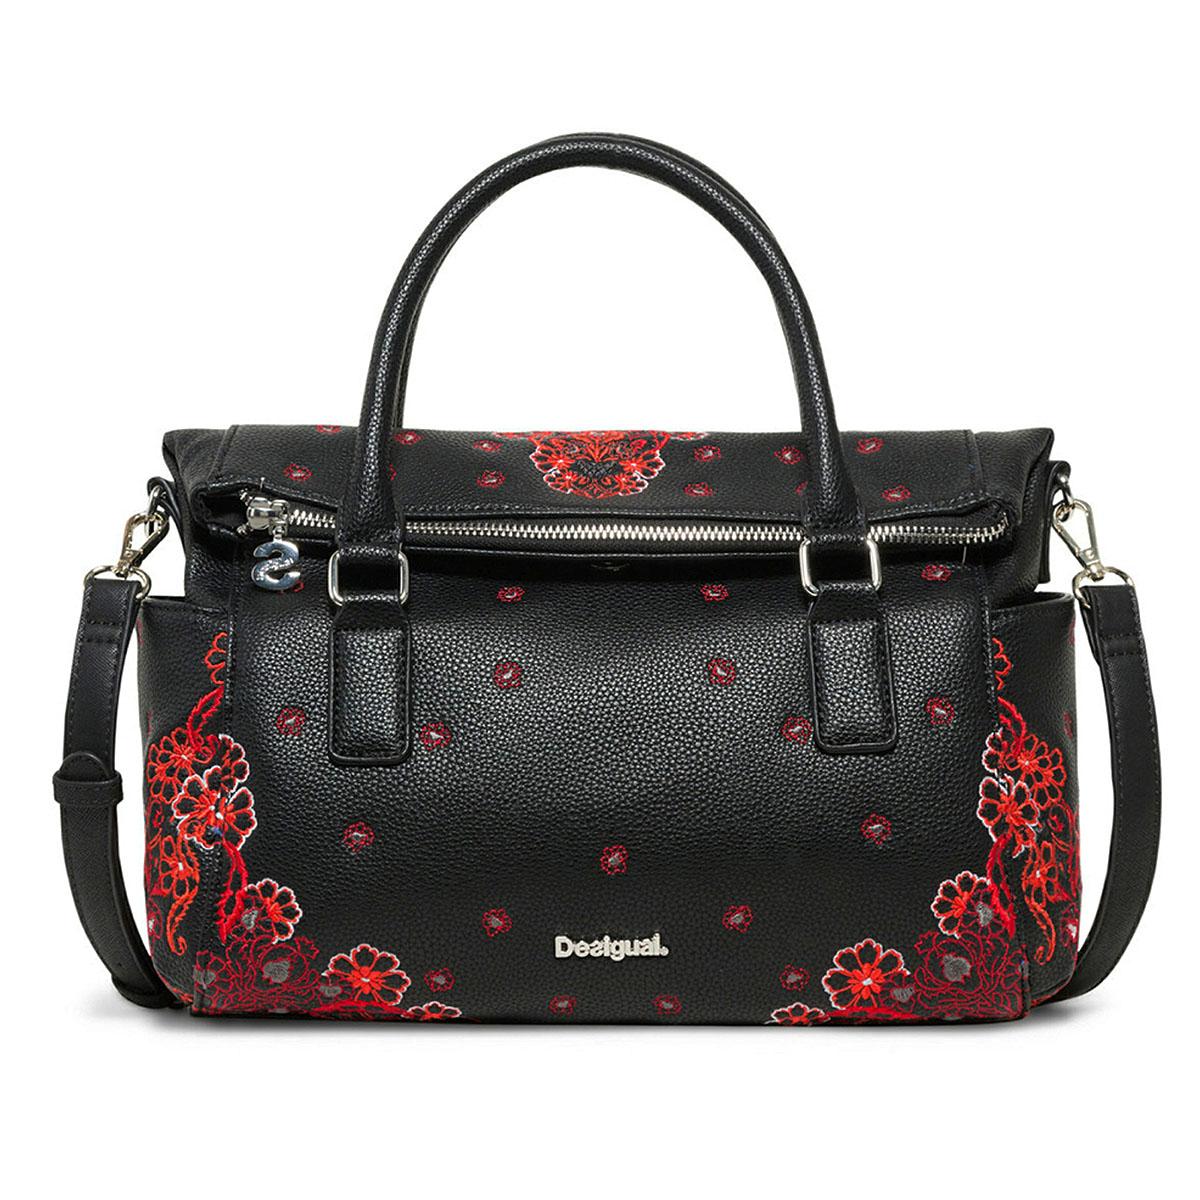 981d288740340 Desigual Handtasche Tasche Bols Manuela Foulard Loverty 18WAXPCC 2000